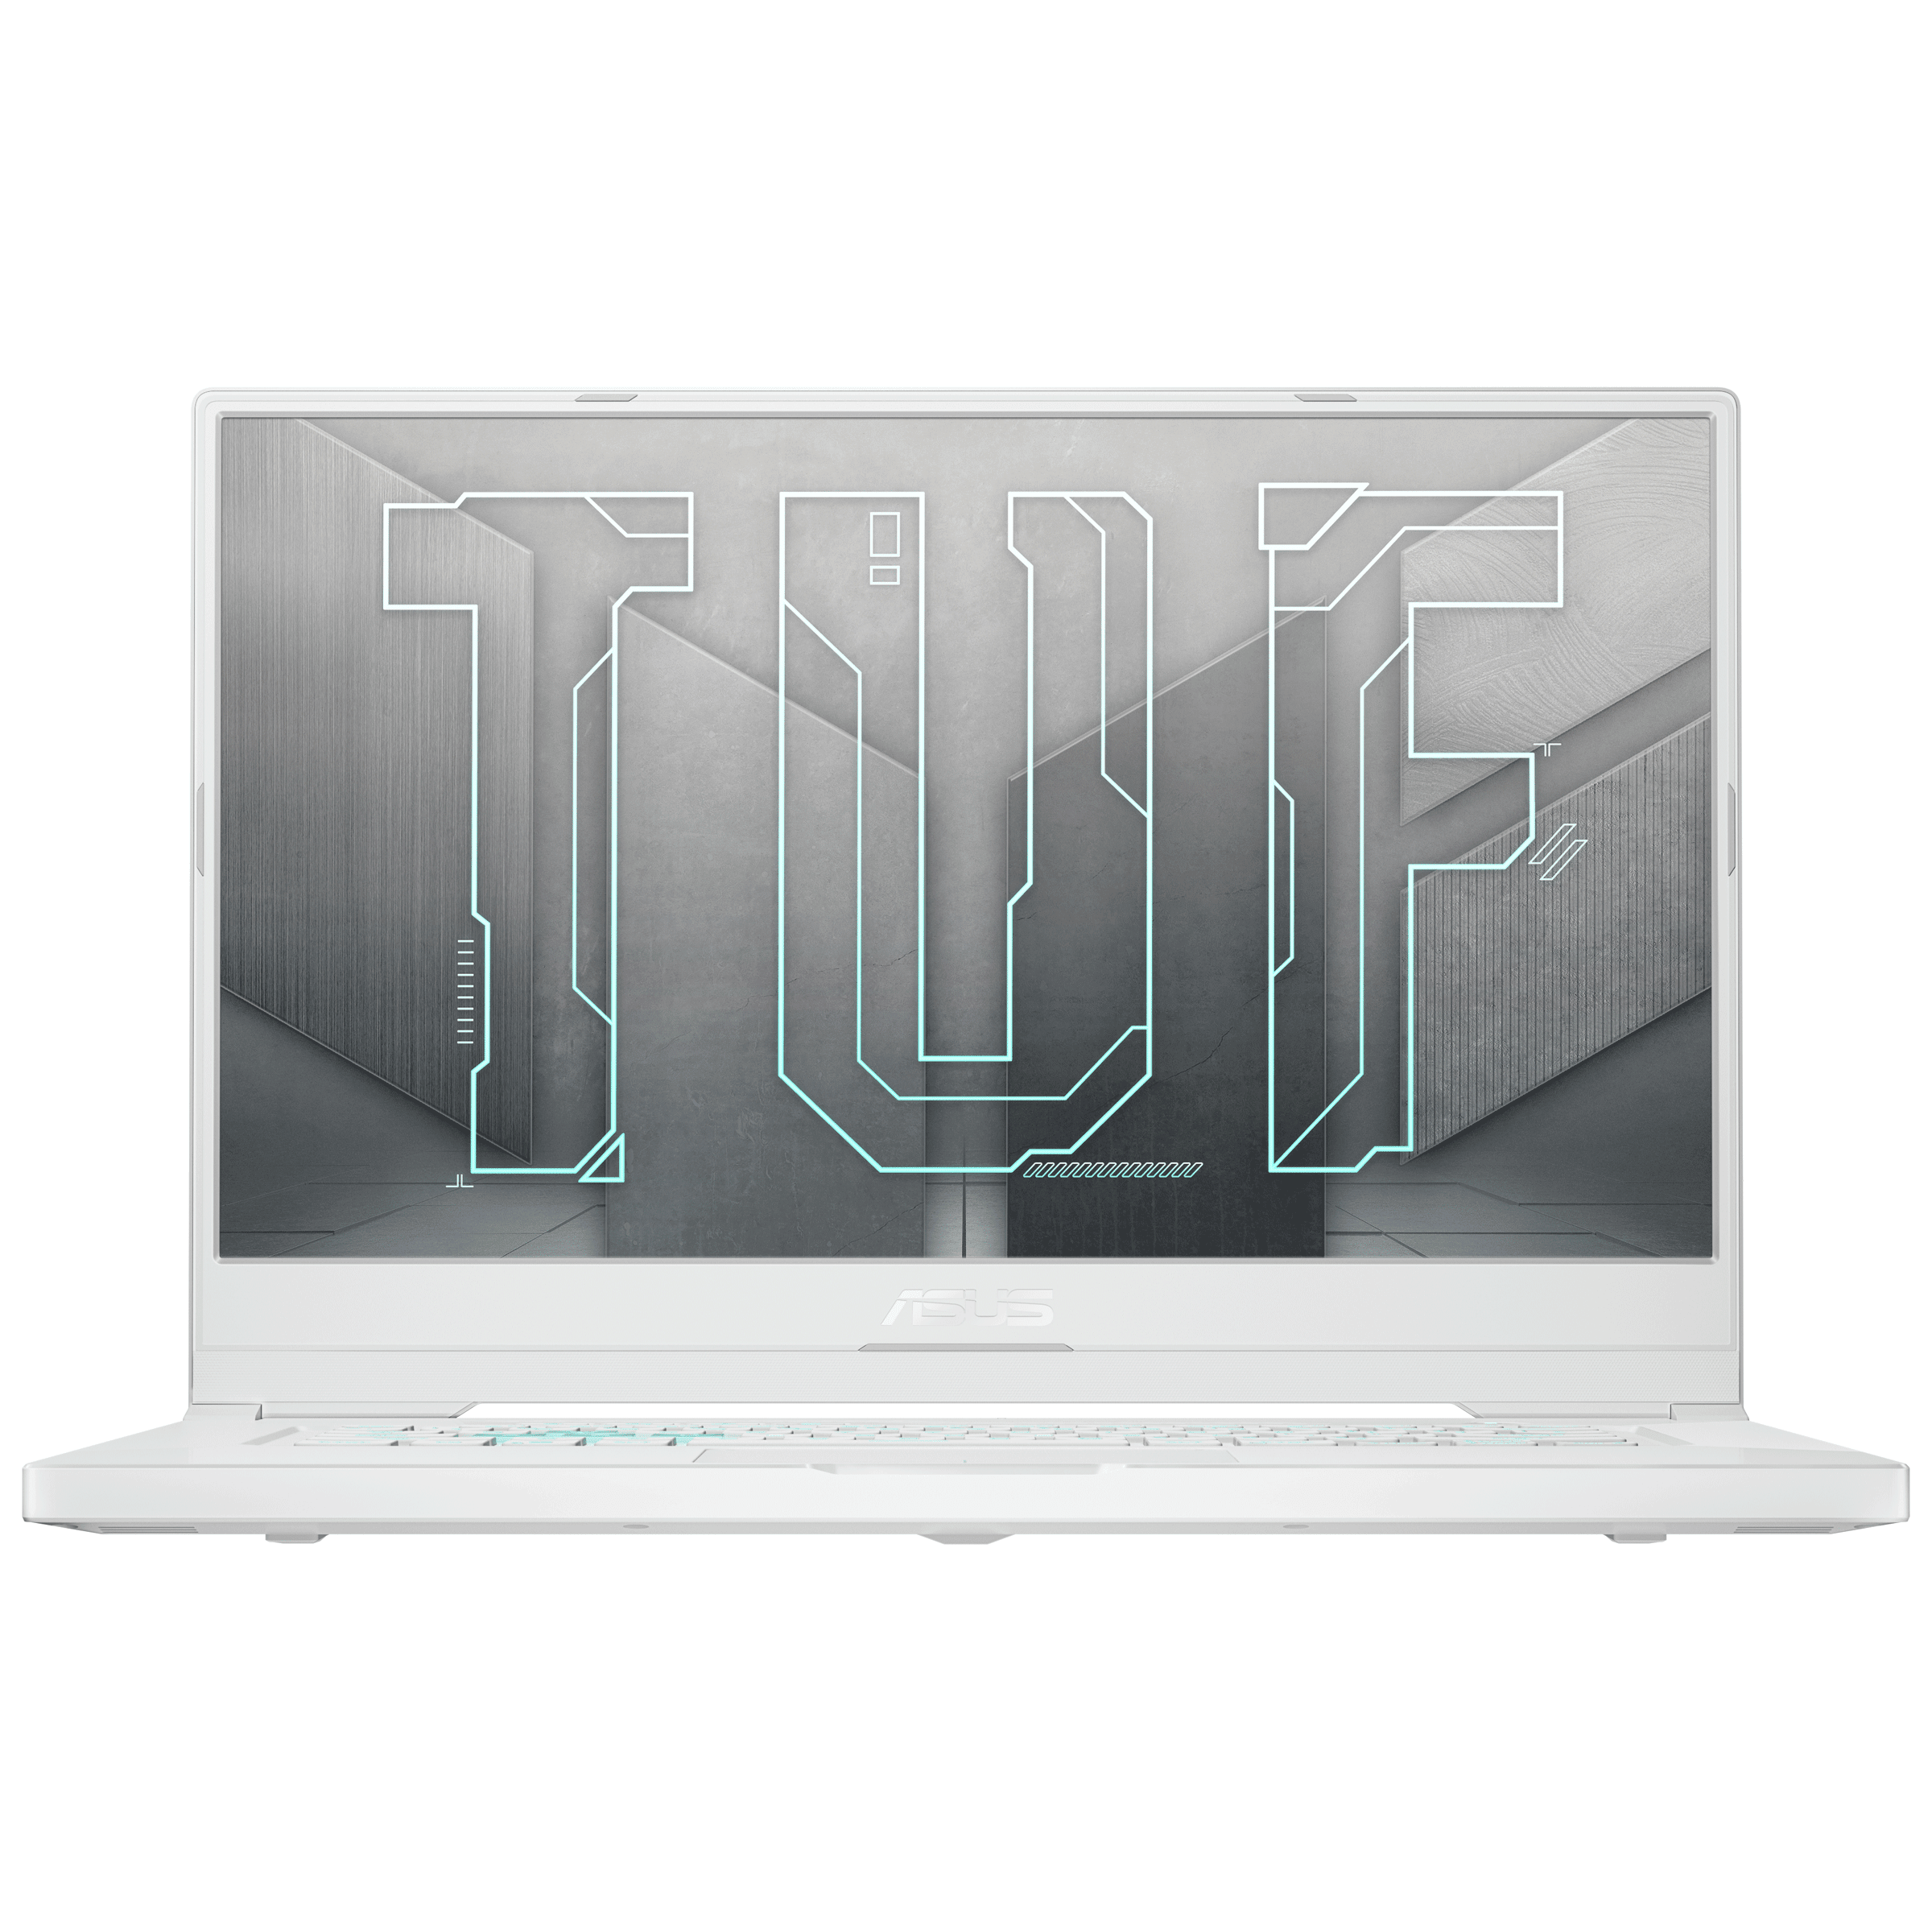 Asus TUF Dash F15 (FX516PR-AZ024TS) Core i7 11th Gen Windows 10 Home Gaming Laptop (16GB RAM, 1TB SSD, NVIDIA GeForce RTX 3070 + 8GB Graphics, MS Office, 39.62cm, Moonlight White)